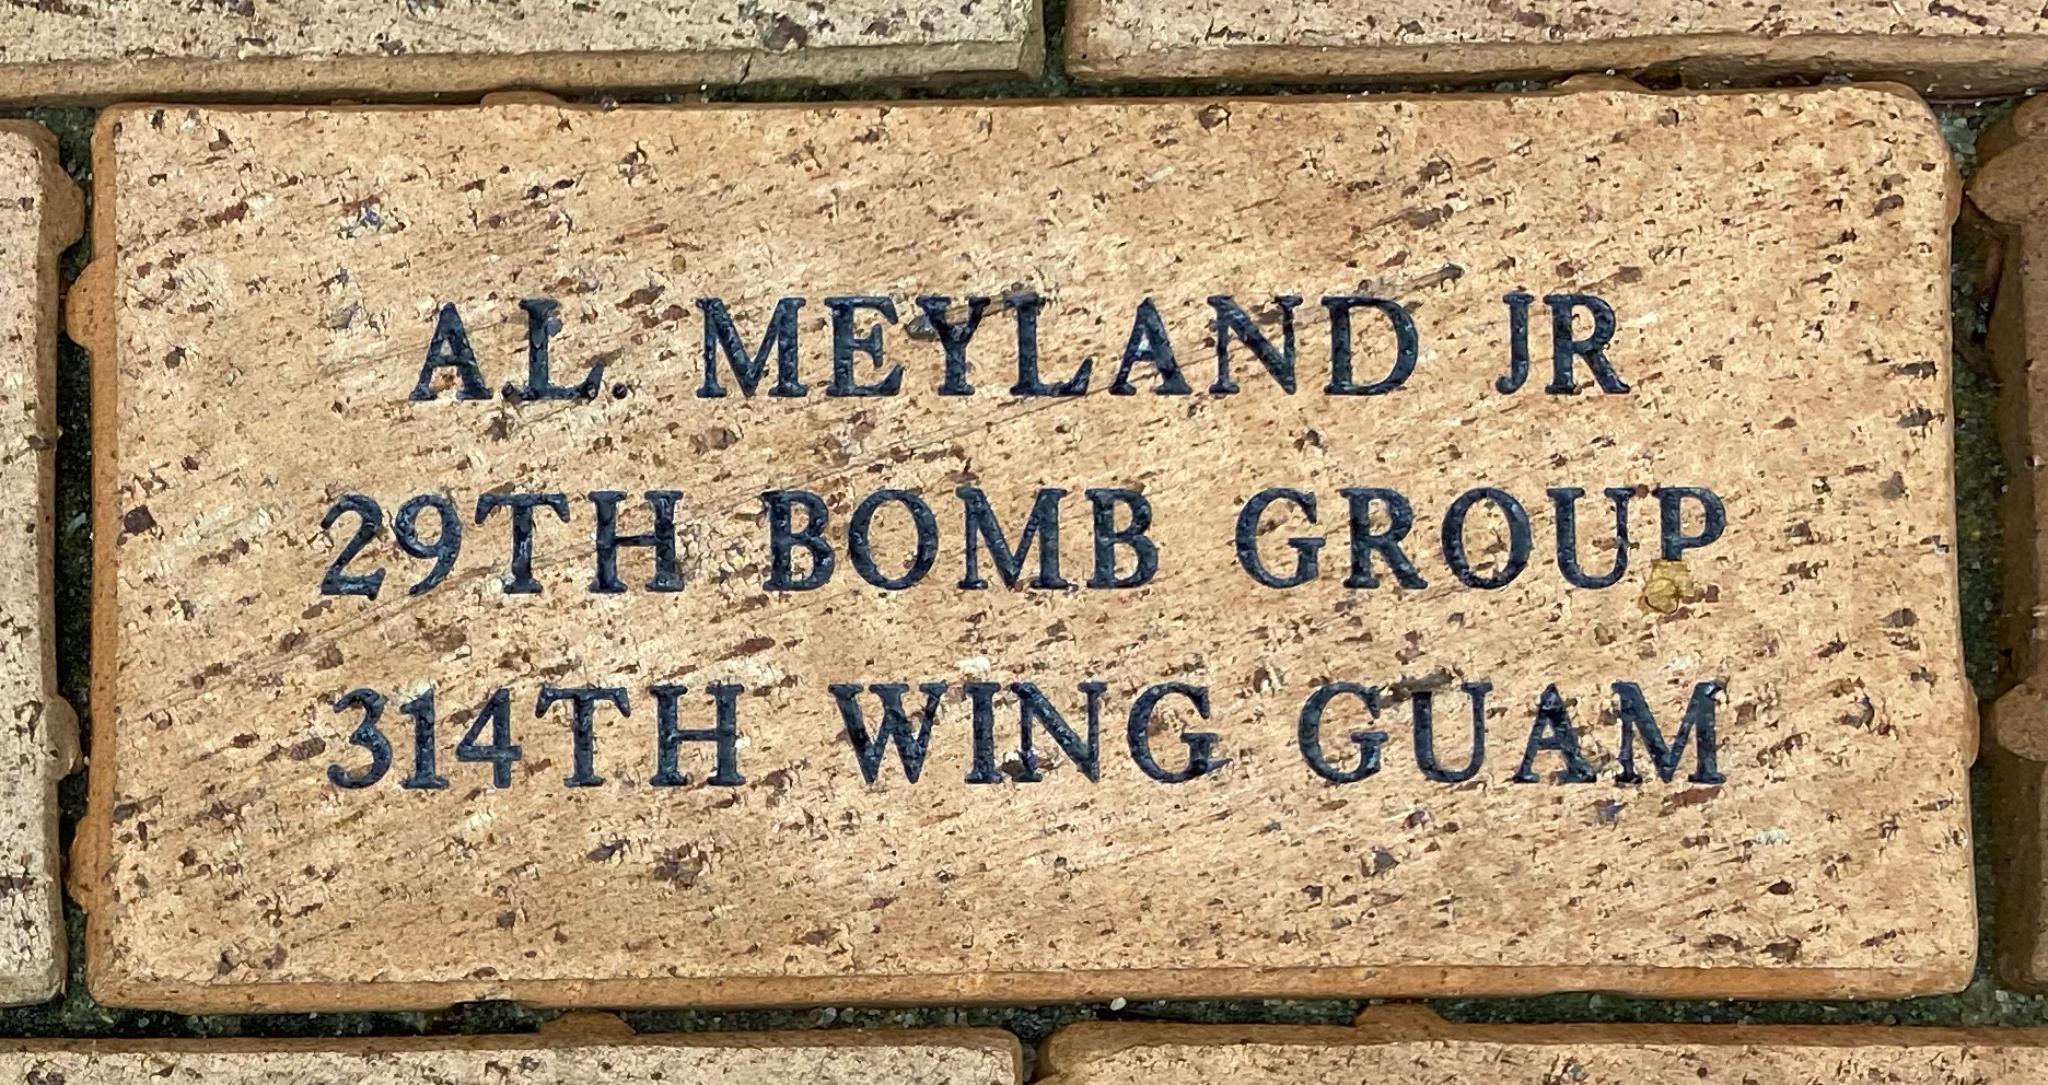 A.L. MEYLAND JR 29TH BOMB GROUP 314TH WING GUAM